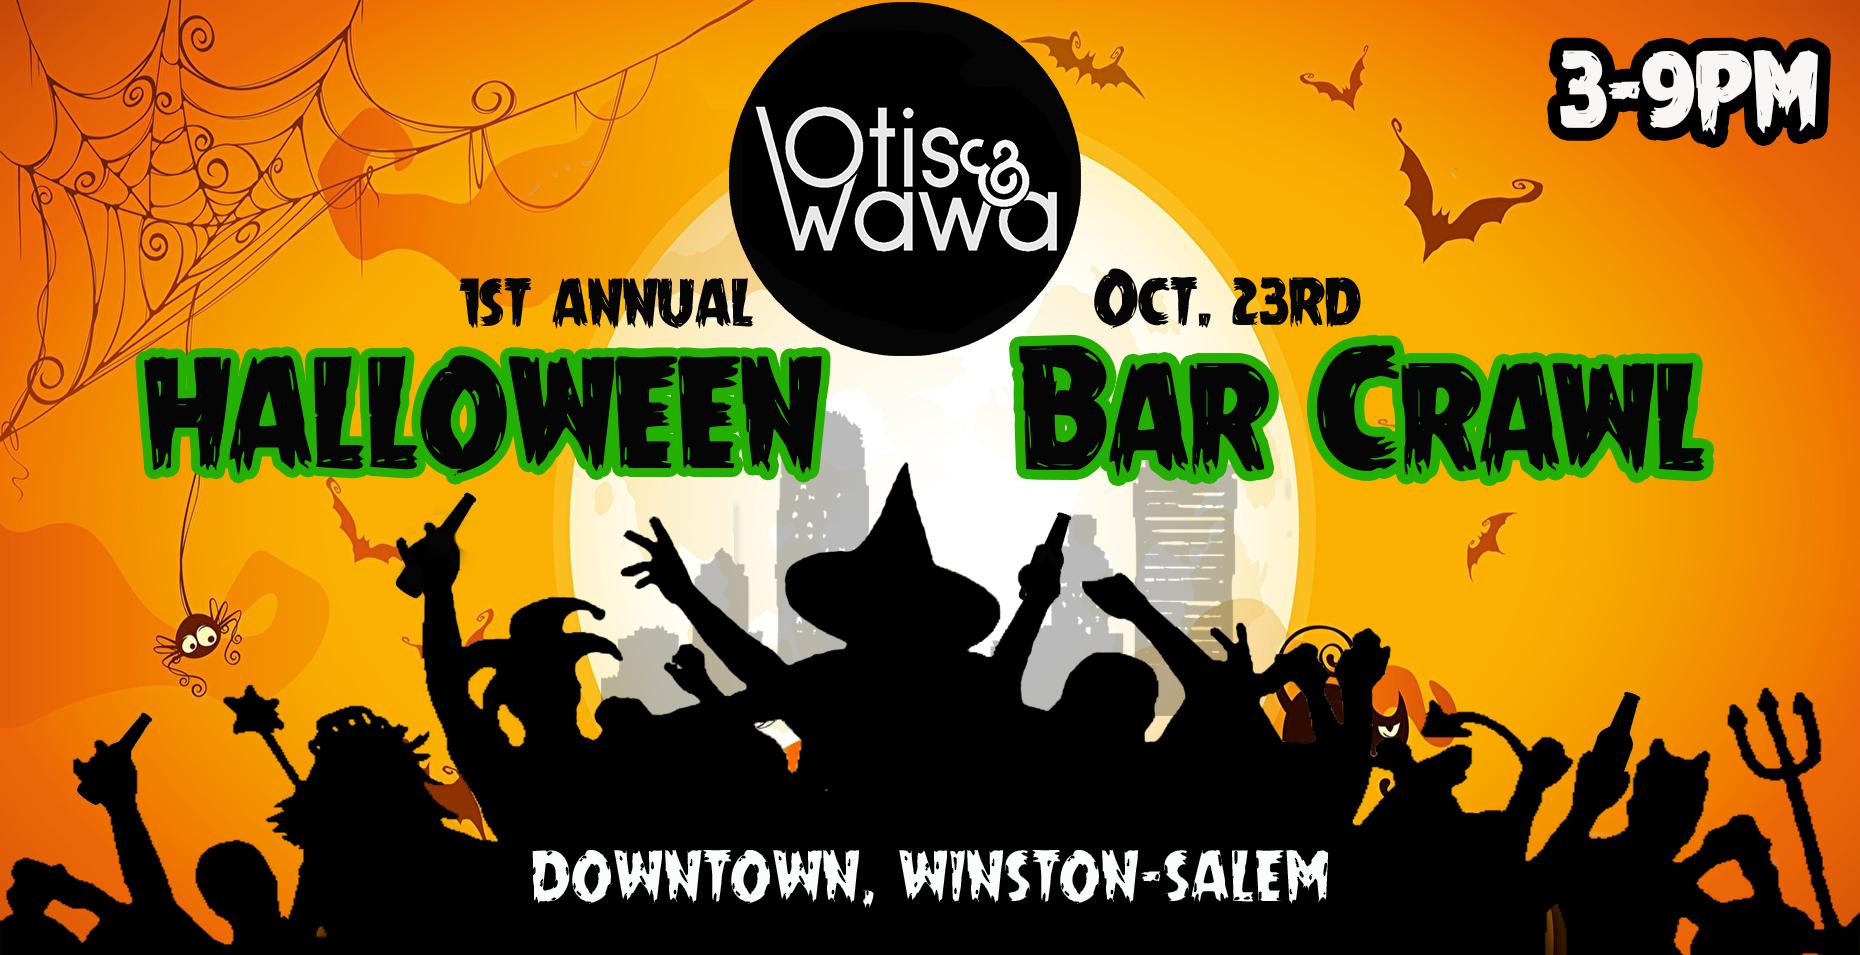 Otis & Wawa's Halloween Bar Crawl